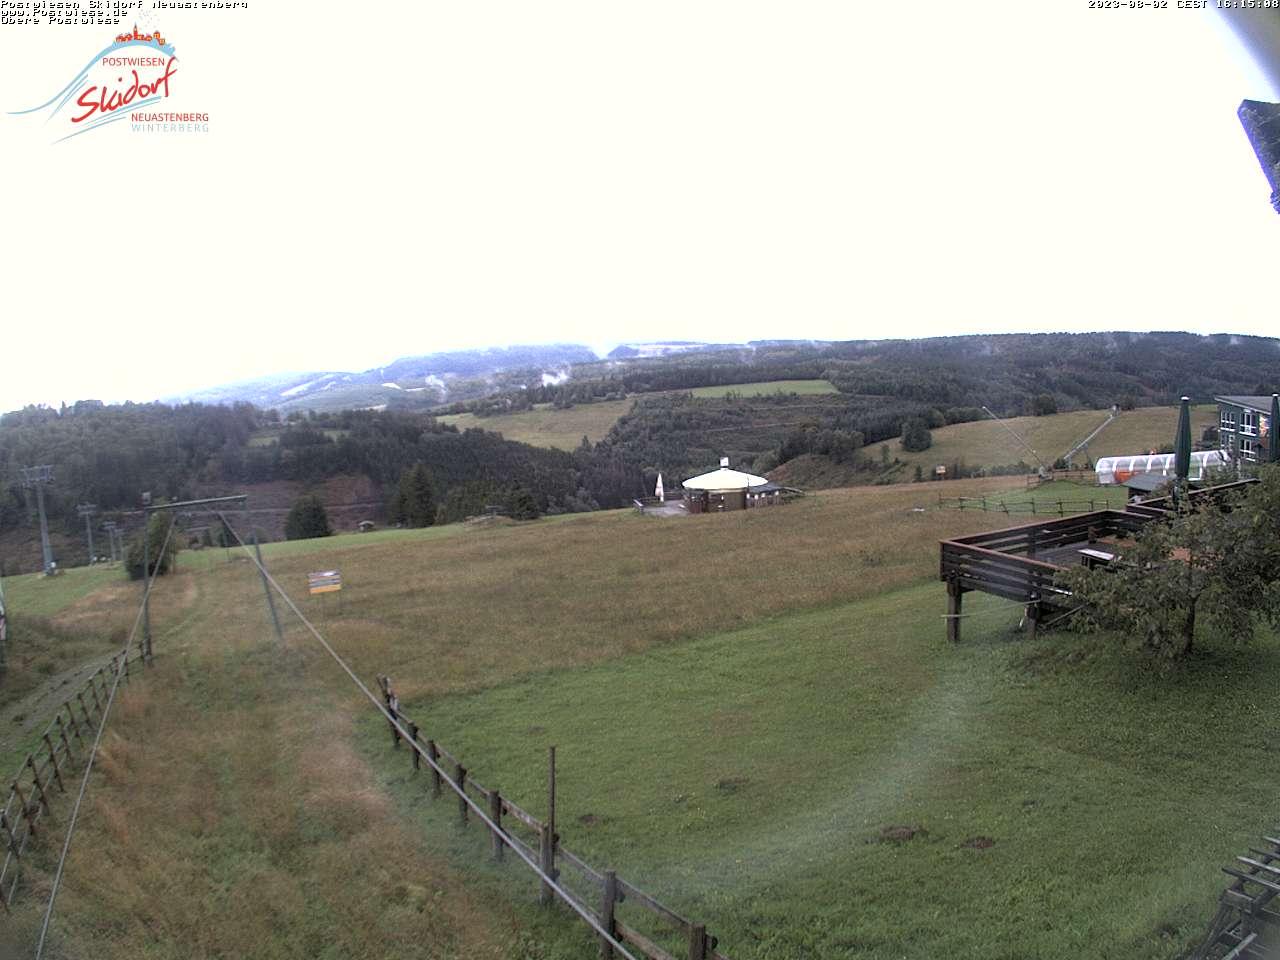 Webcam Skigebiet Neuastenberg Postwiese - Skiliftkarussell Winterberg